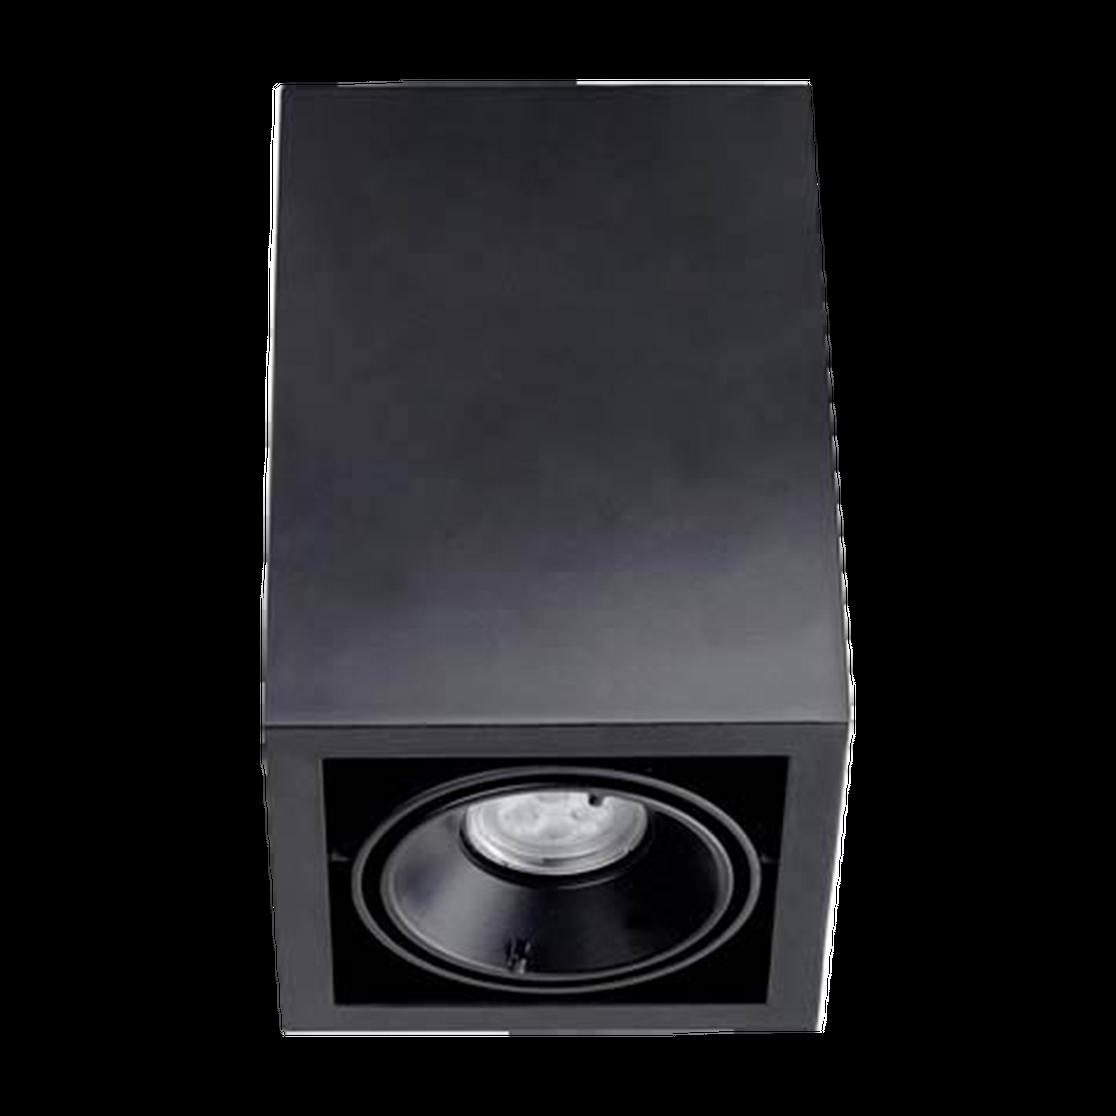 Multidir Evo S Surface - Single